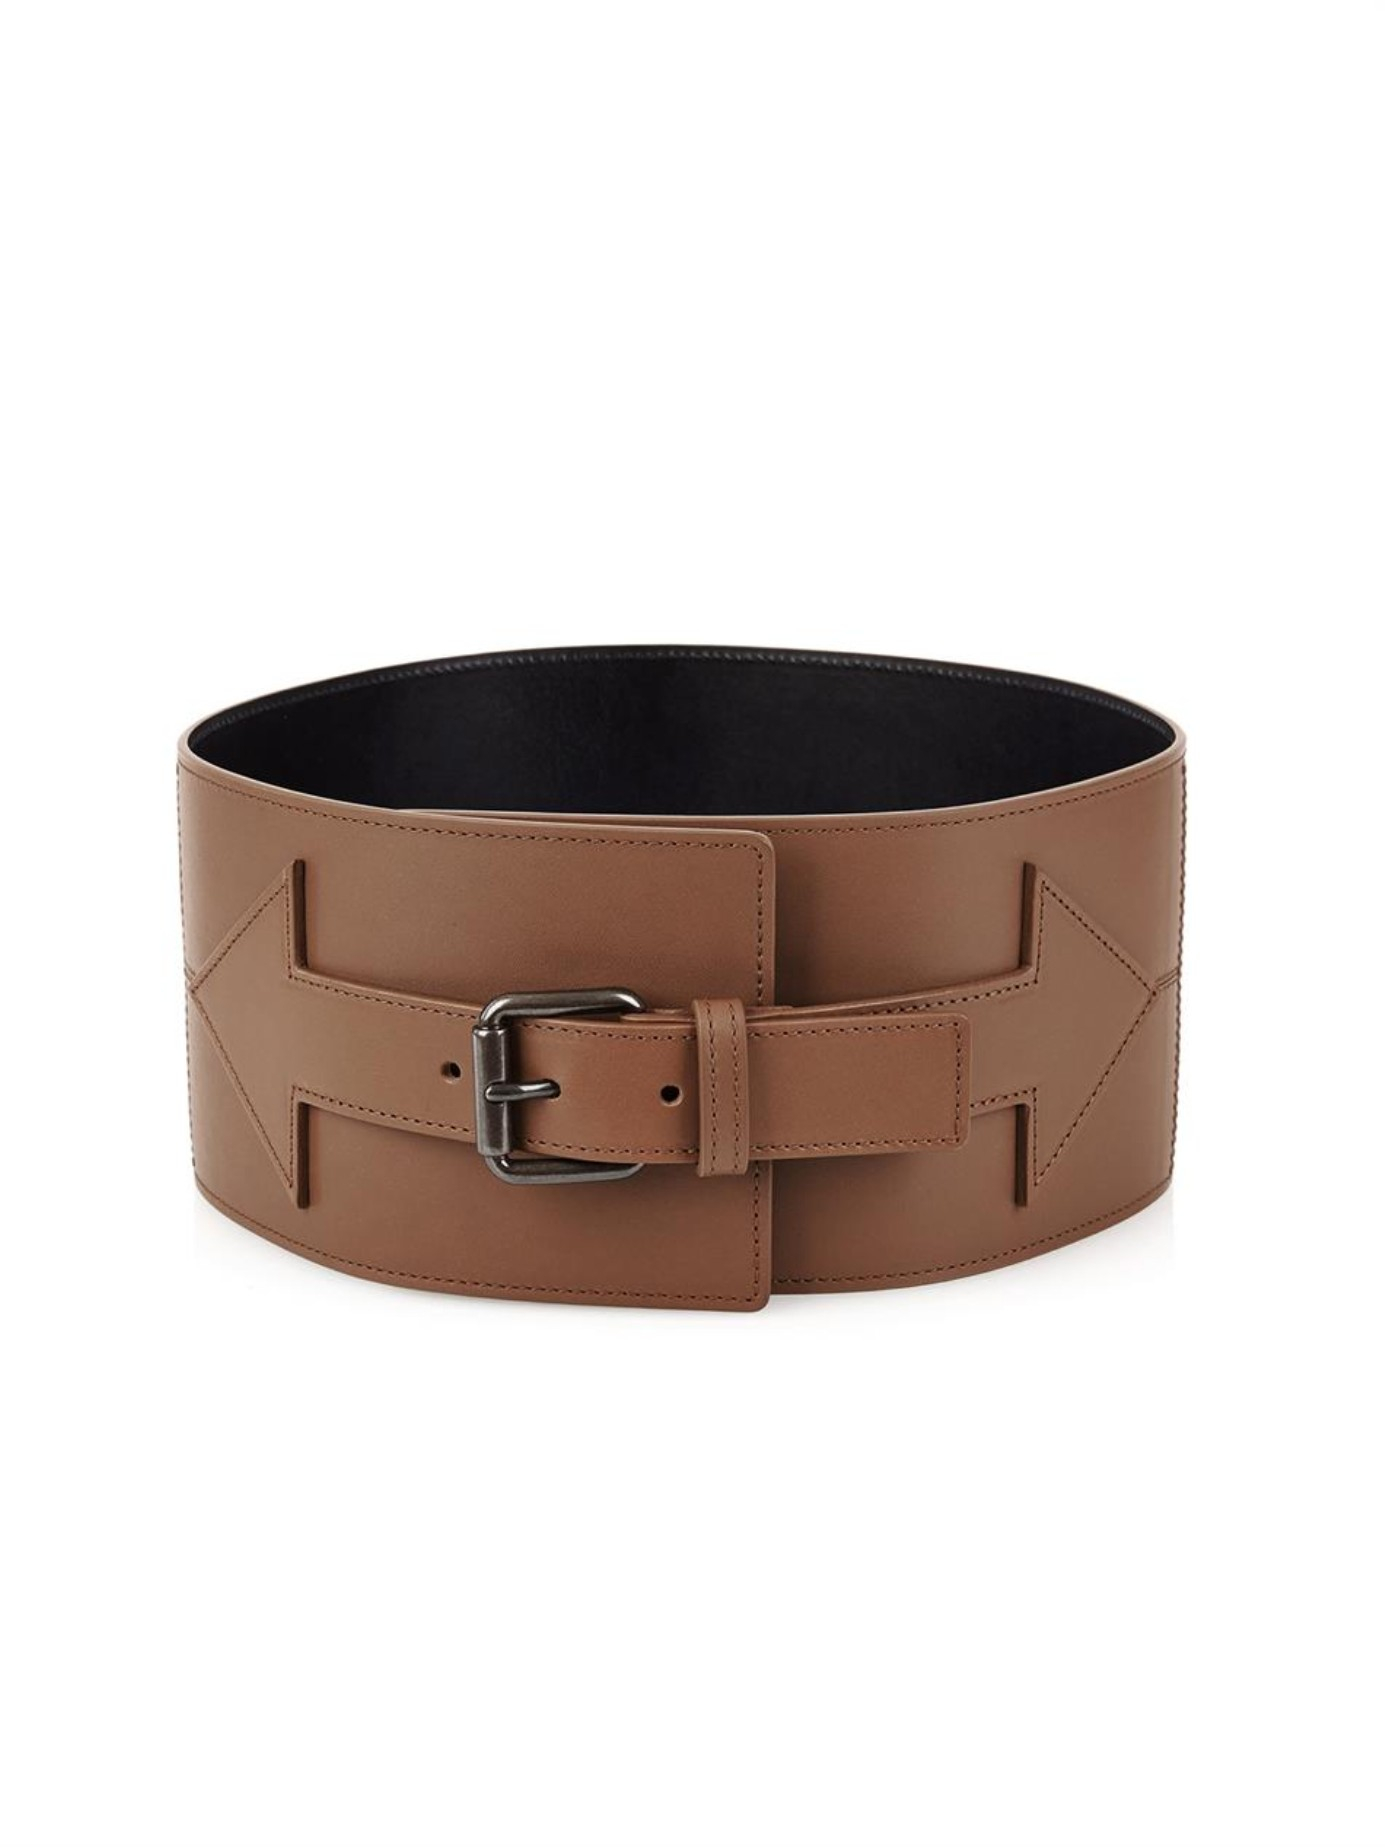 tomas maier arrow wide leather waist belt in brown lyst